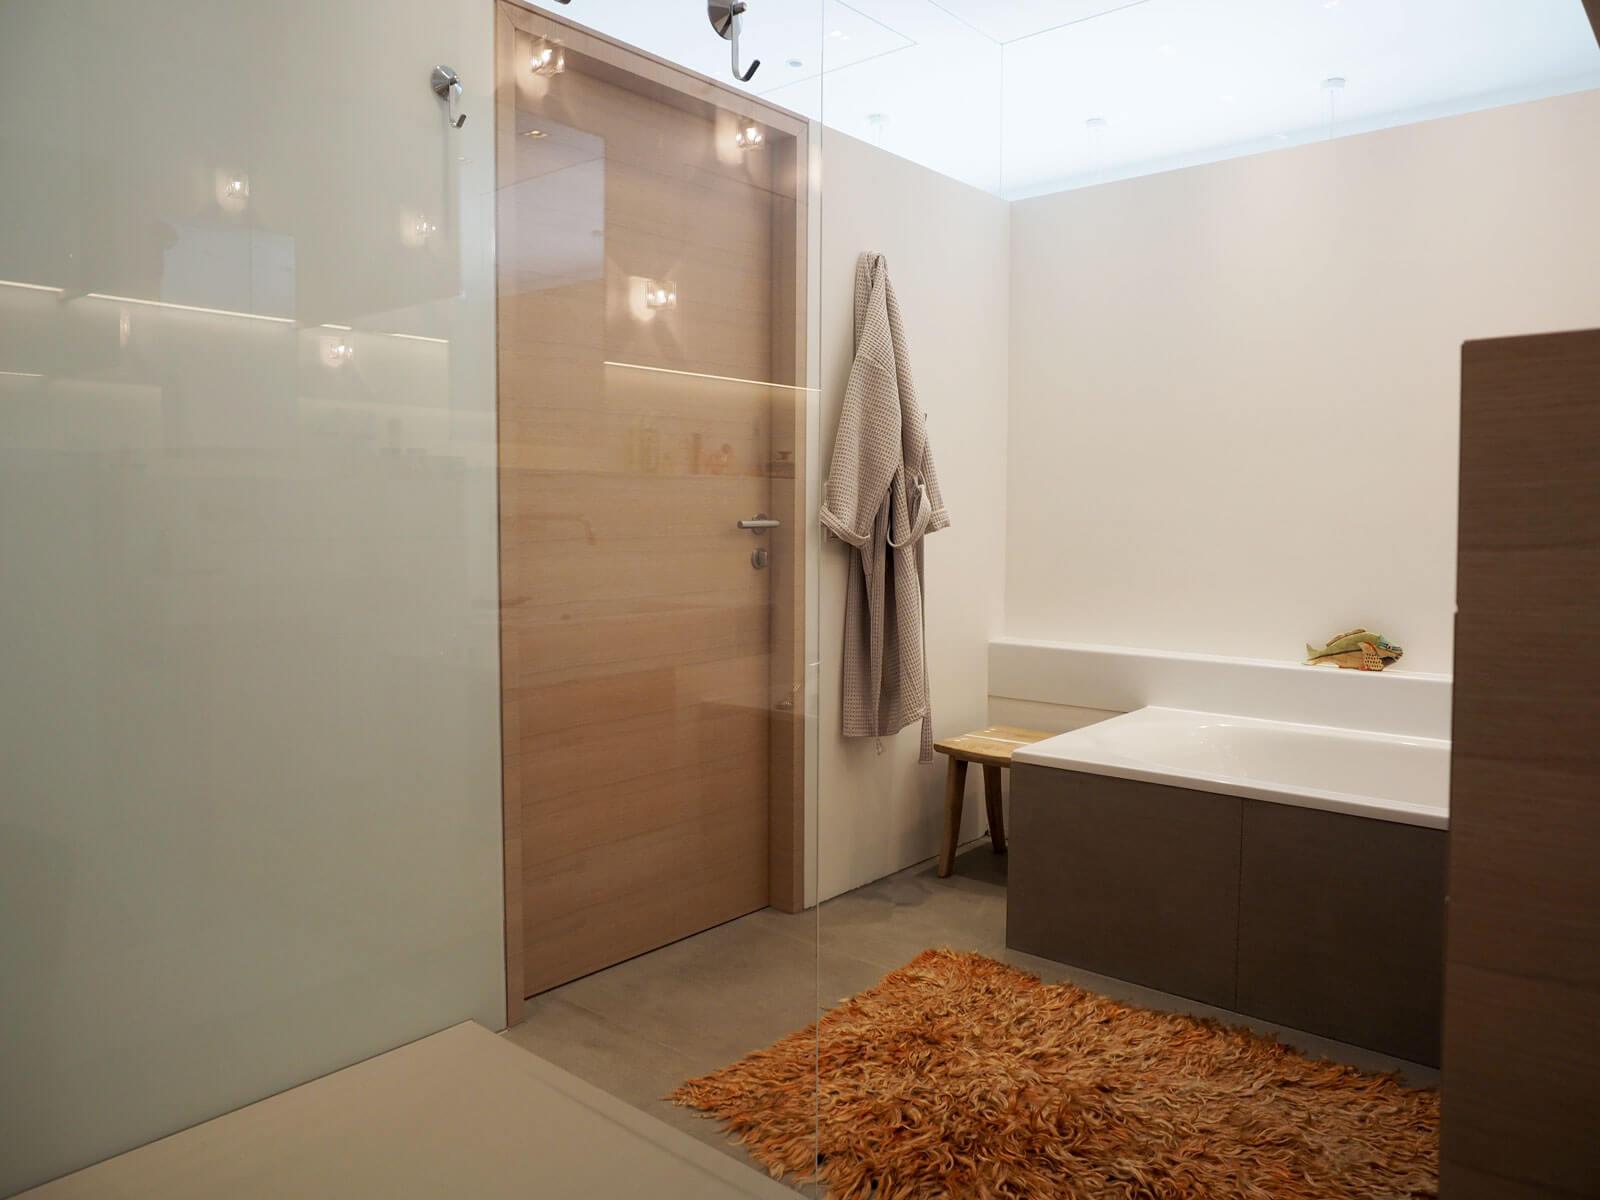 hocker aus der terunobu fujimori kollektion. Black Bedroom Furniture Sets. Home Design Ideas